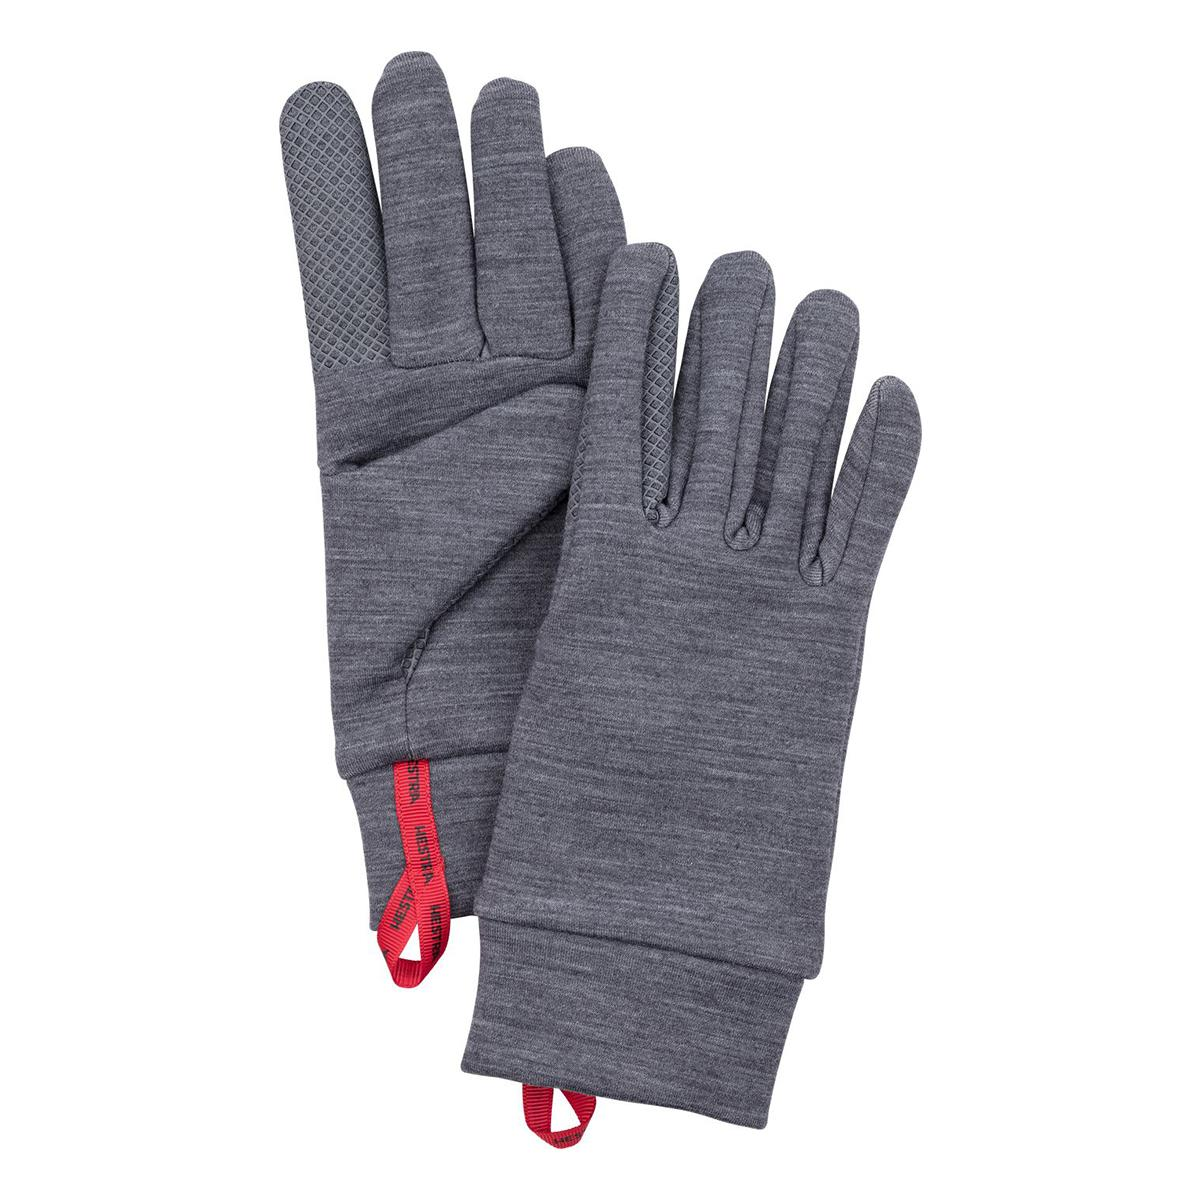 Hestra Touch Point Warmth Glove Liner